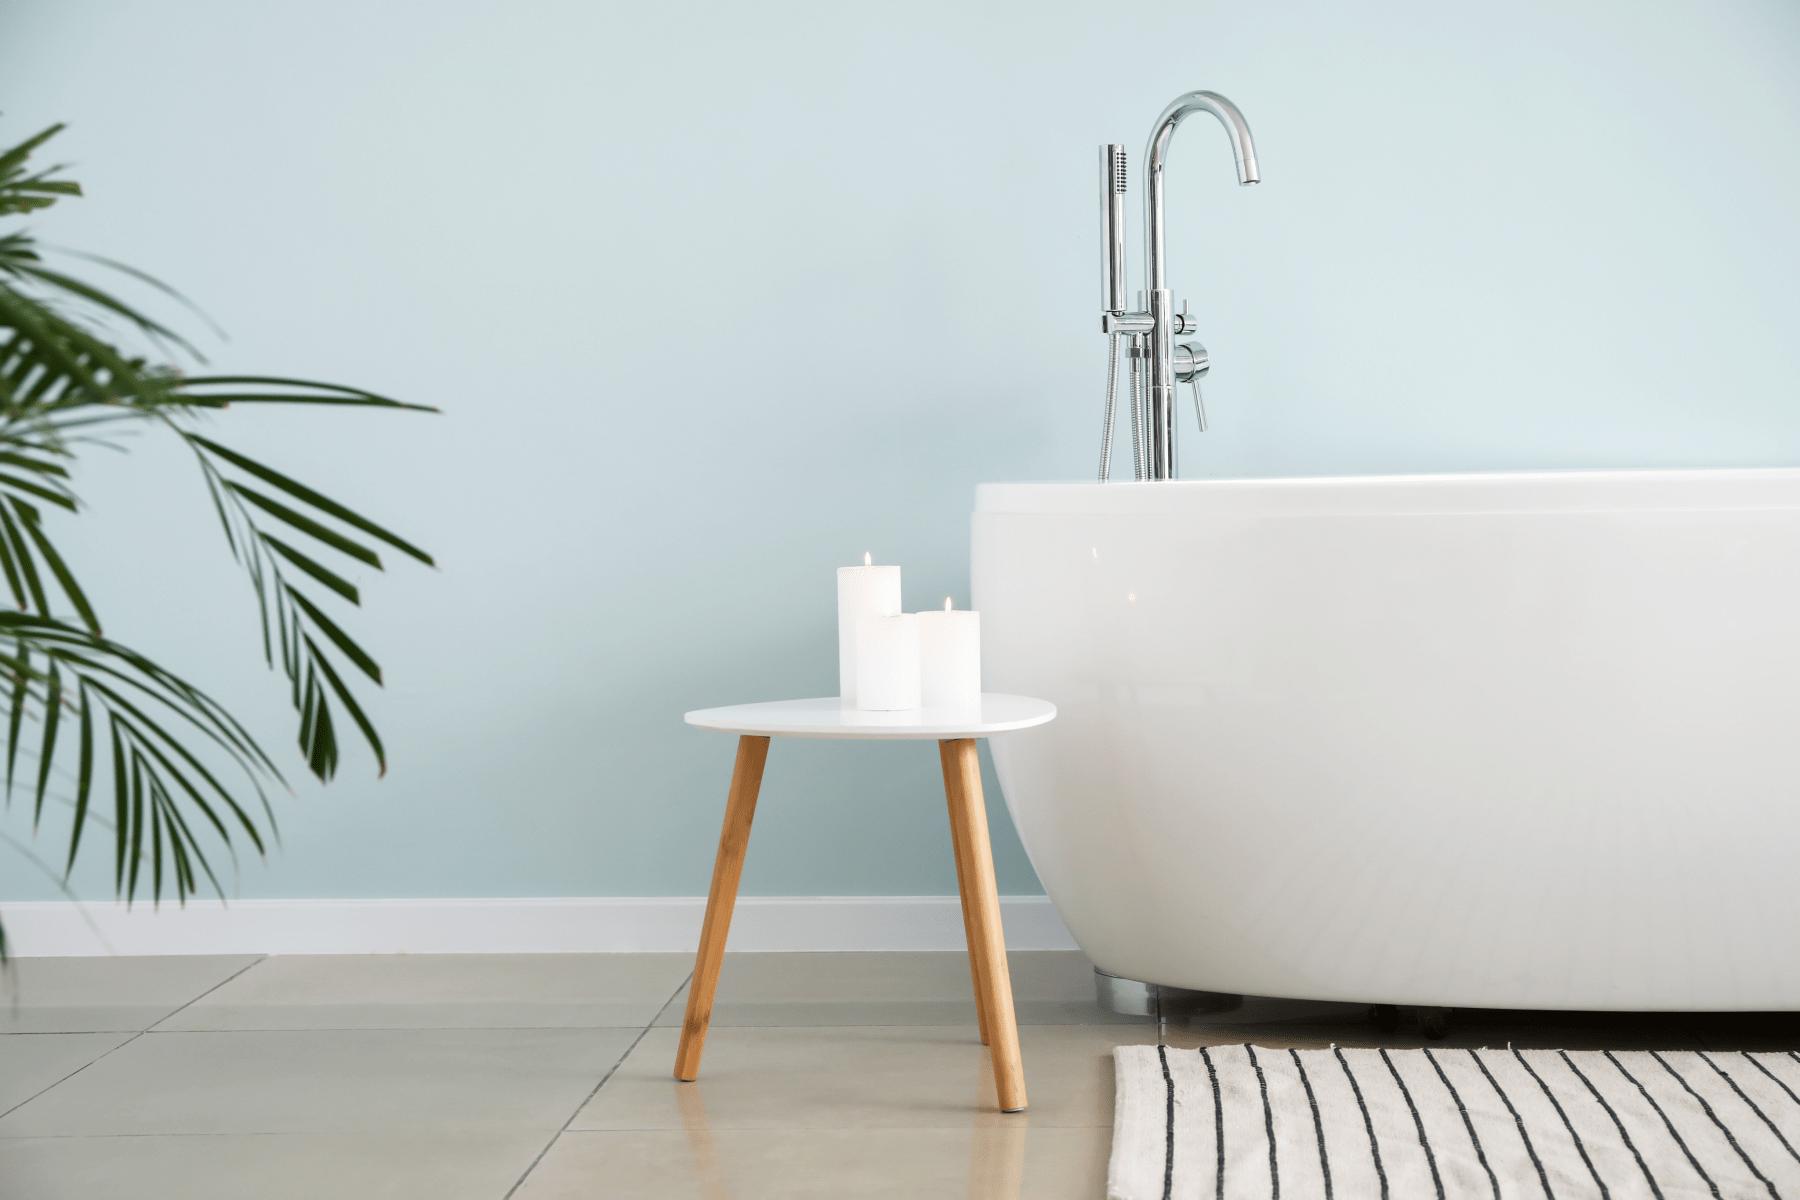 Close-up of a modern bath tub